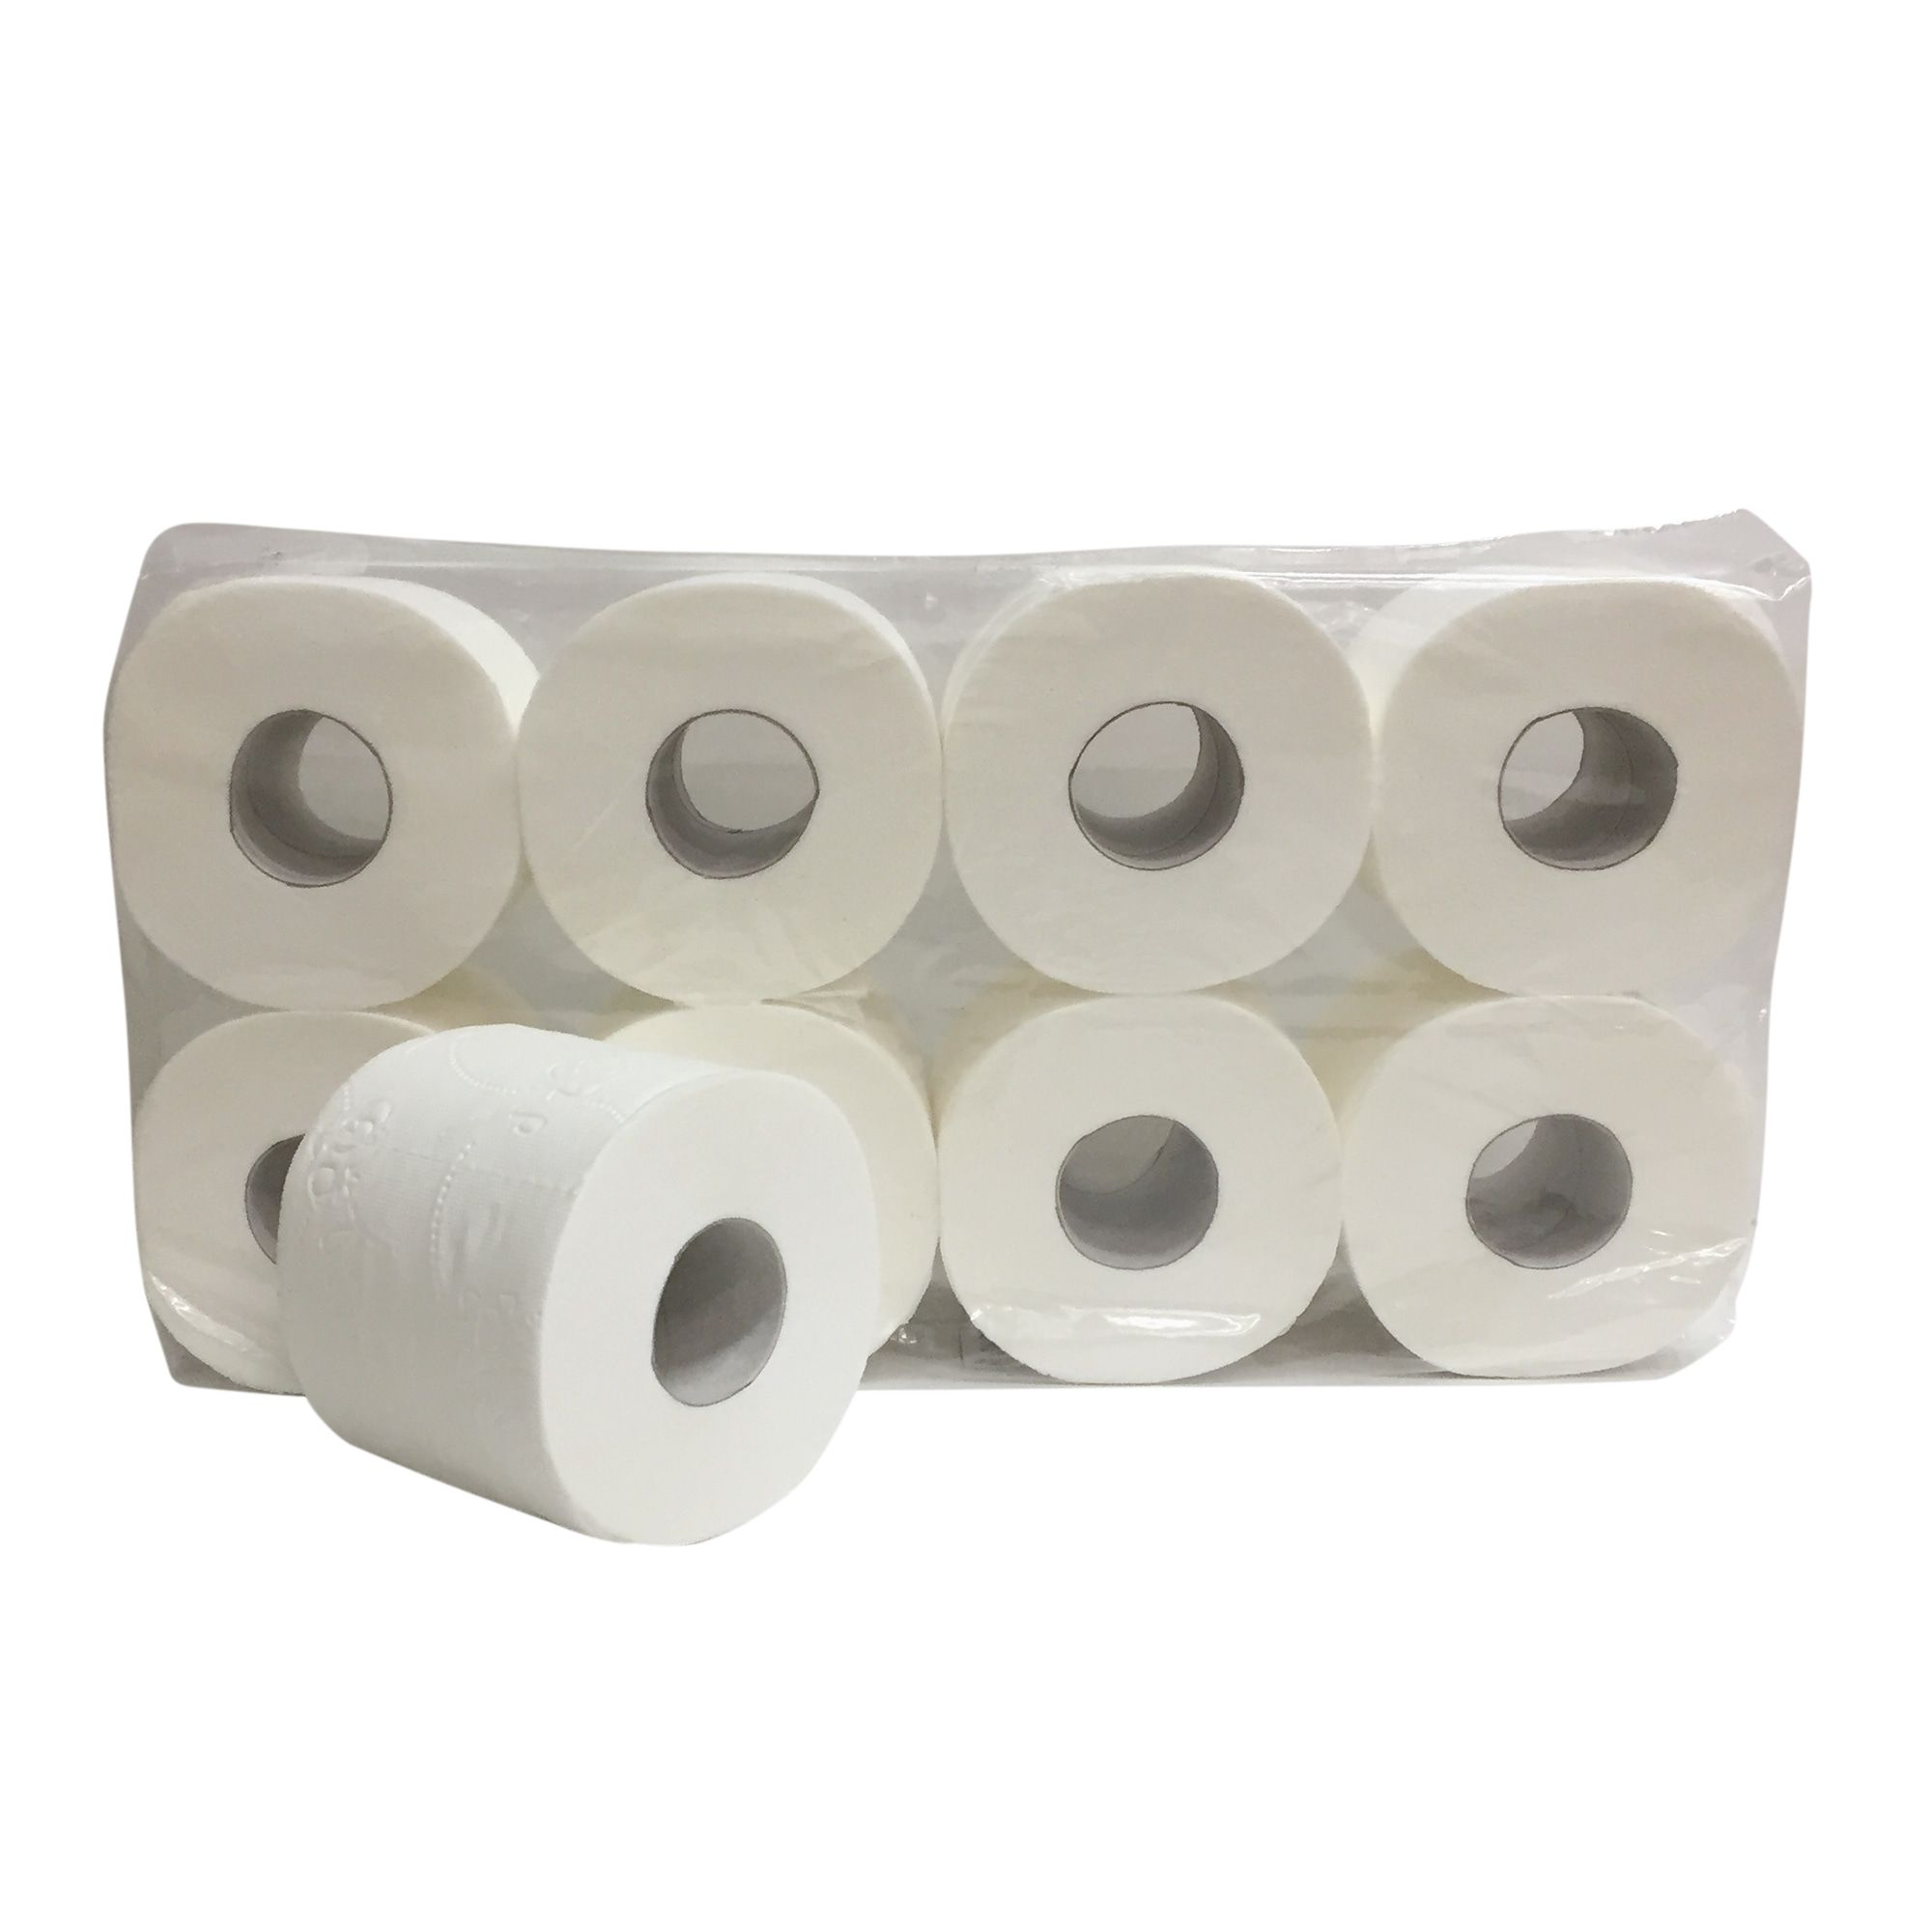 Toiletpapier soft cellulose 3laags 250vel 56 rollen (230013)